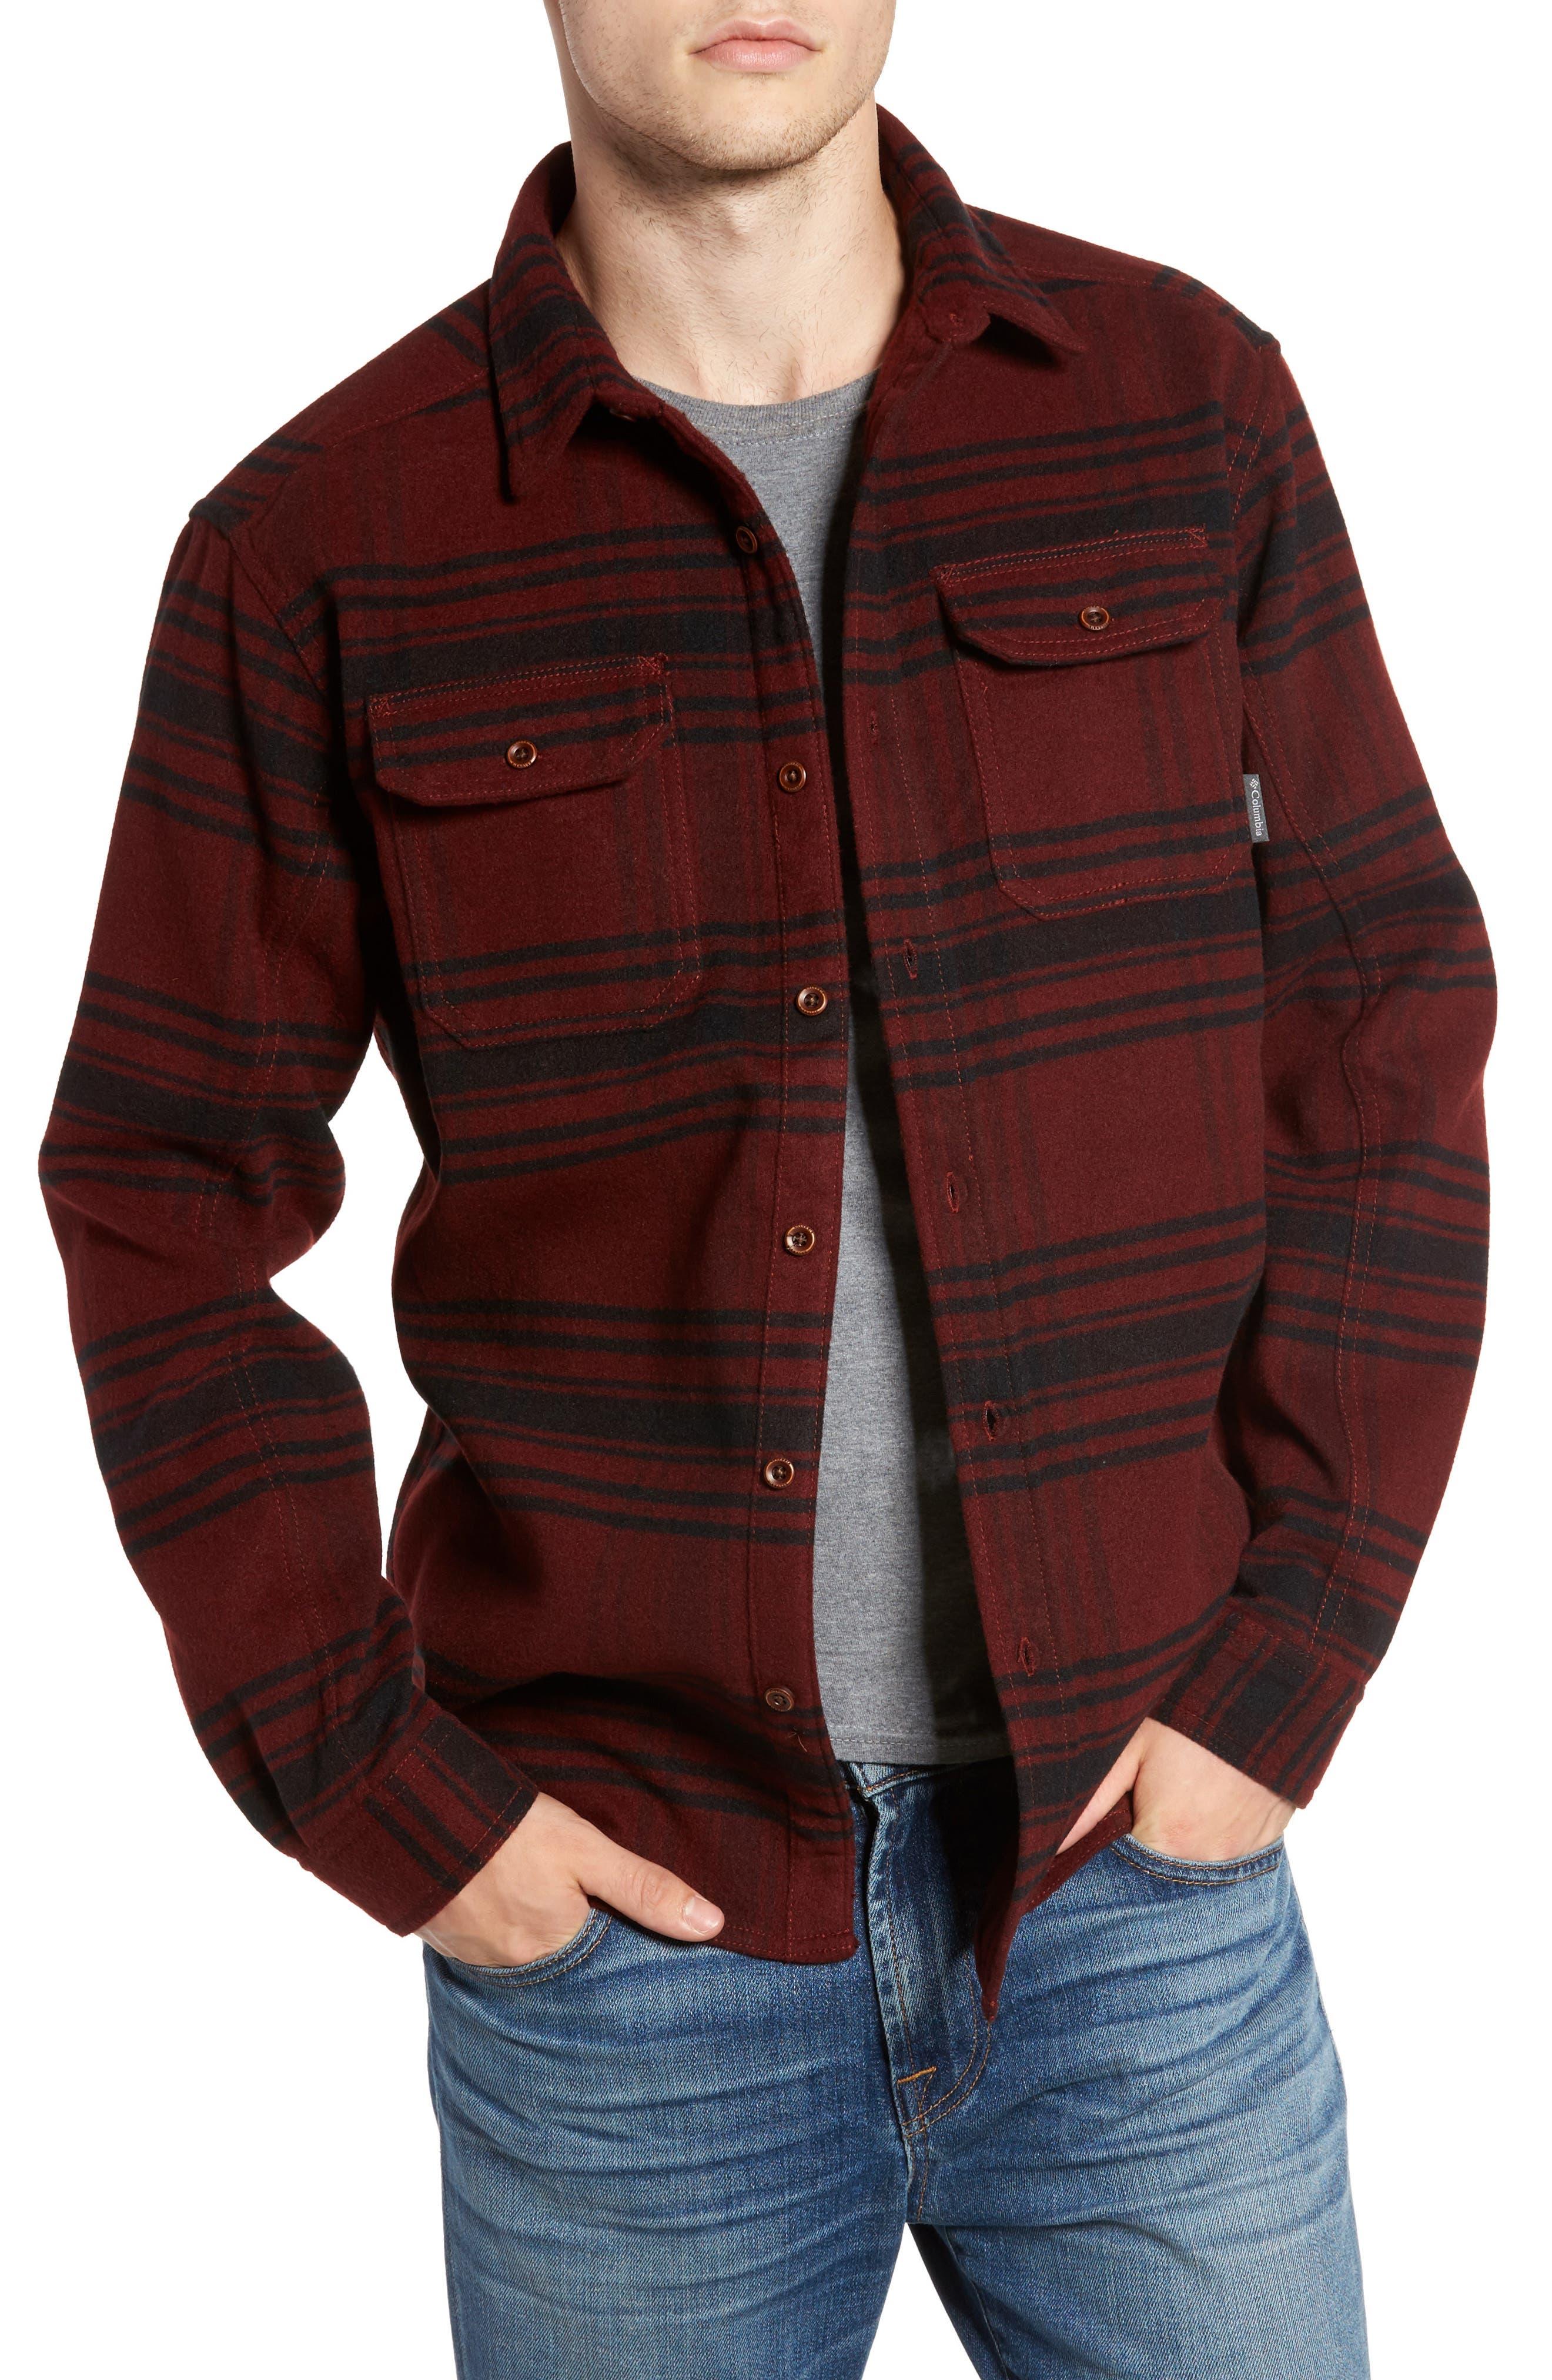 Deschutes River<sup>™</sup> Heavyweight Flannel Shirt Jacket,                         Main,                         color, Deep Rust Plaid